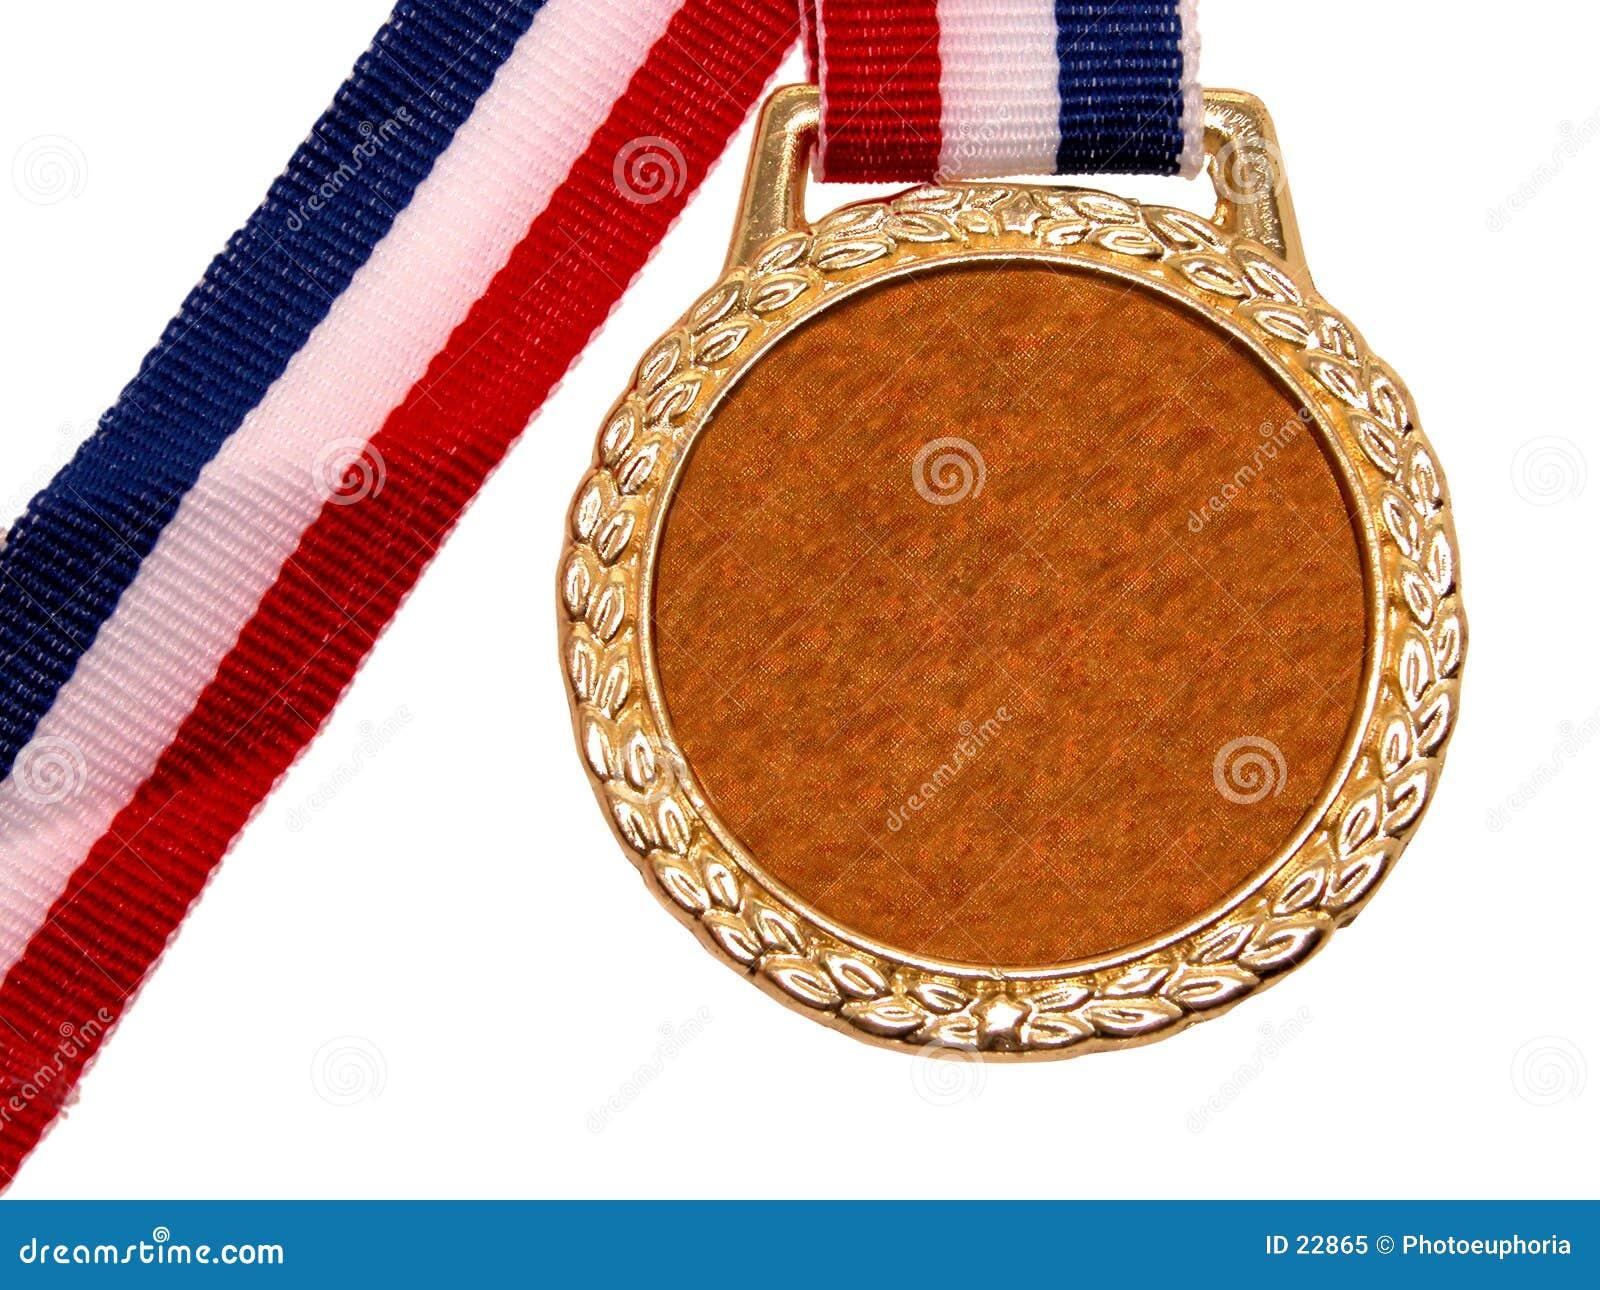 Medalha de ouro brilhante (1 de 2)